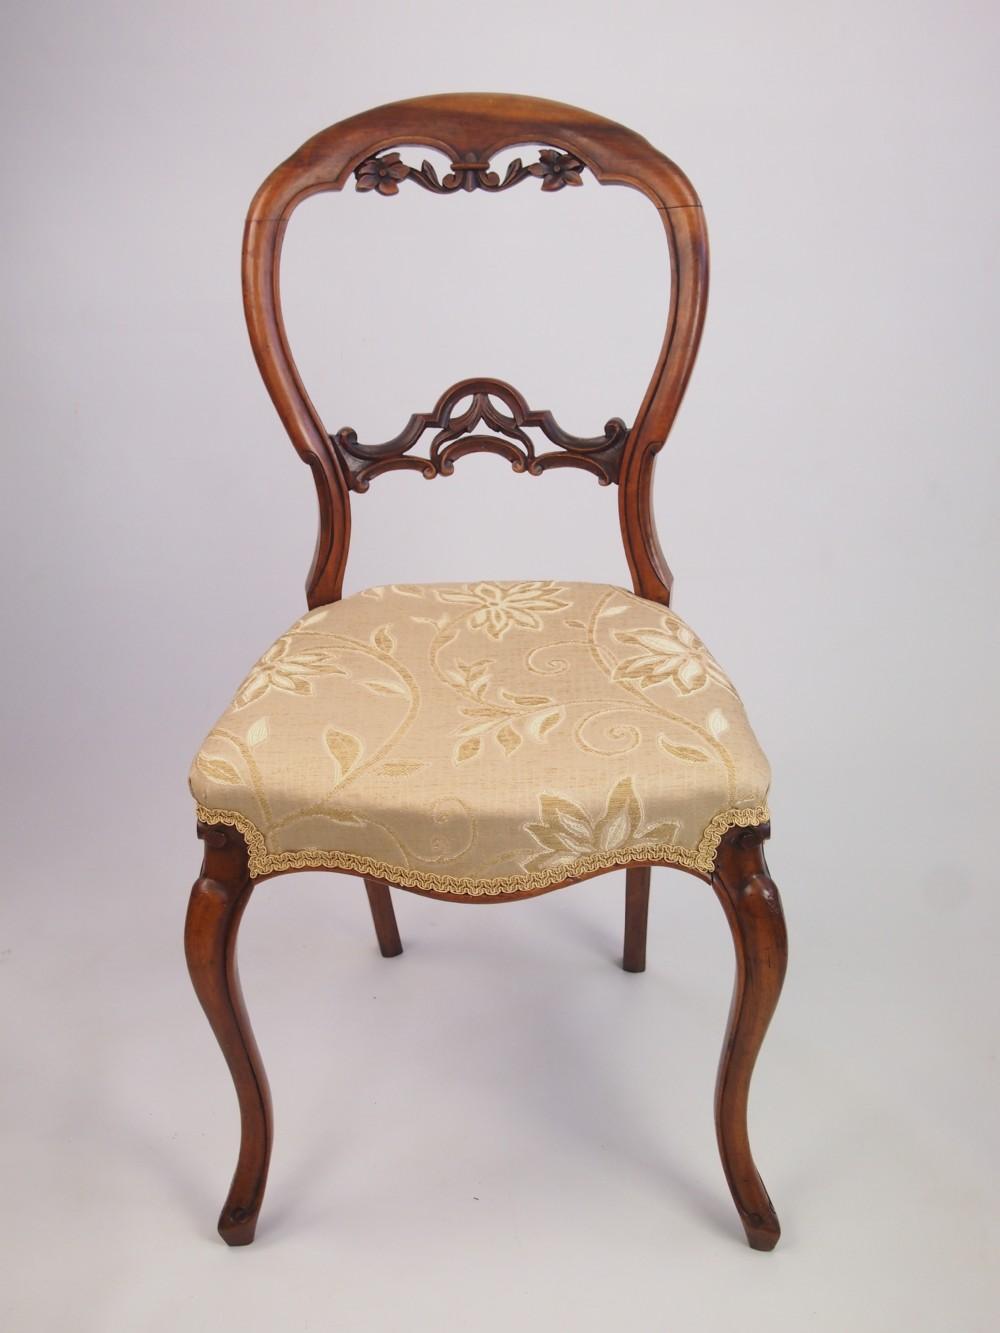 Antique Victorian Walnut Balloon Back Chair 263383